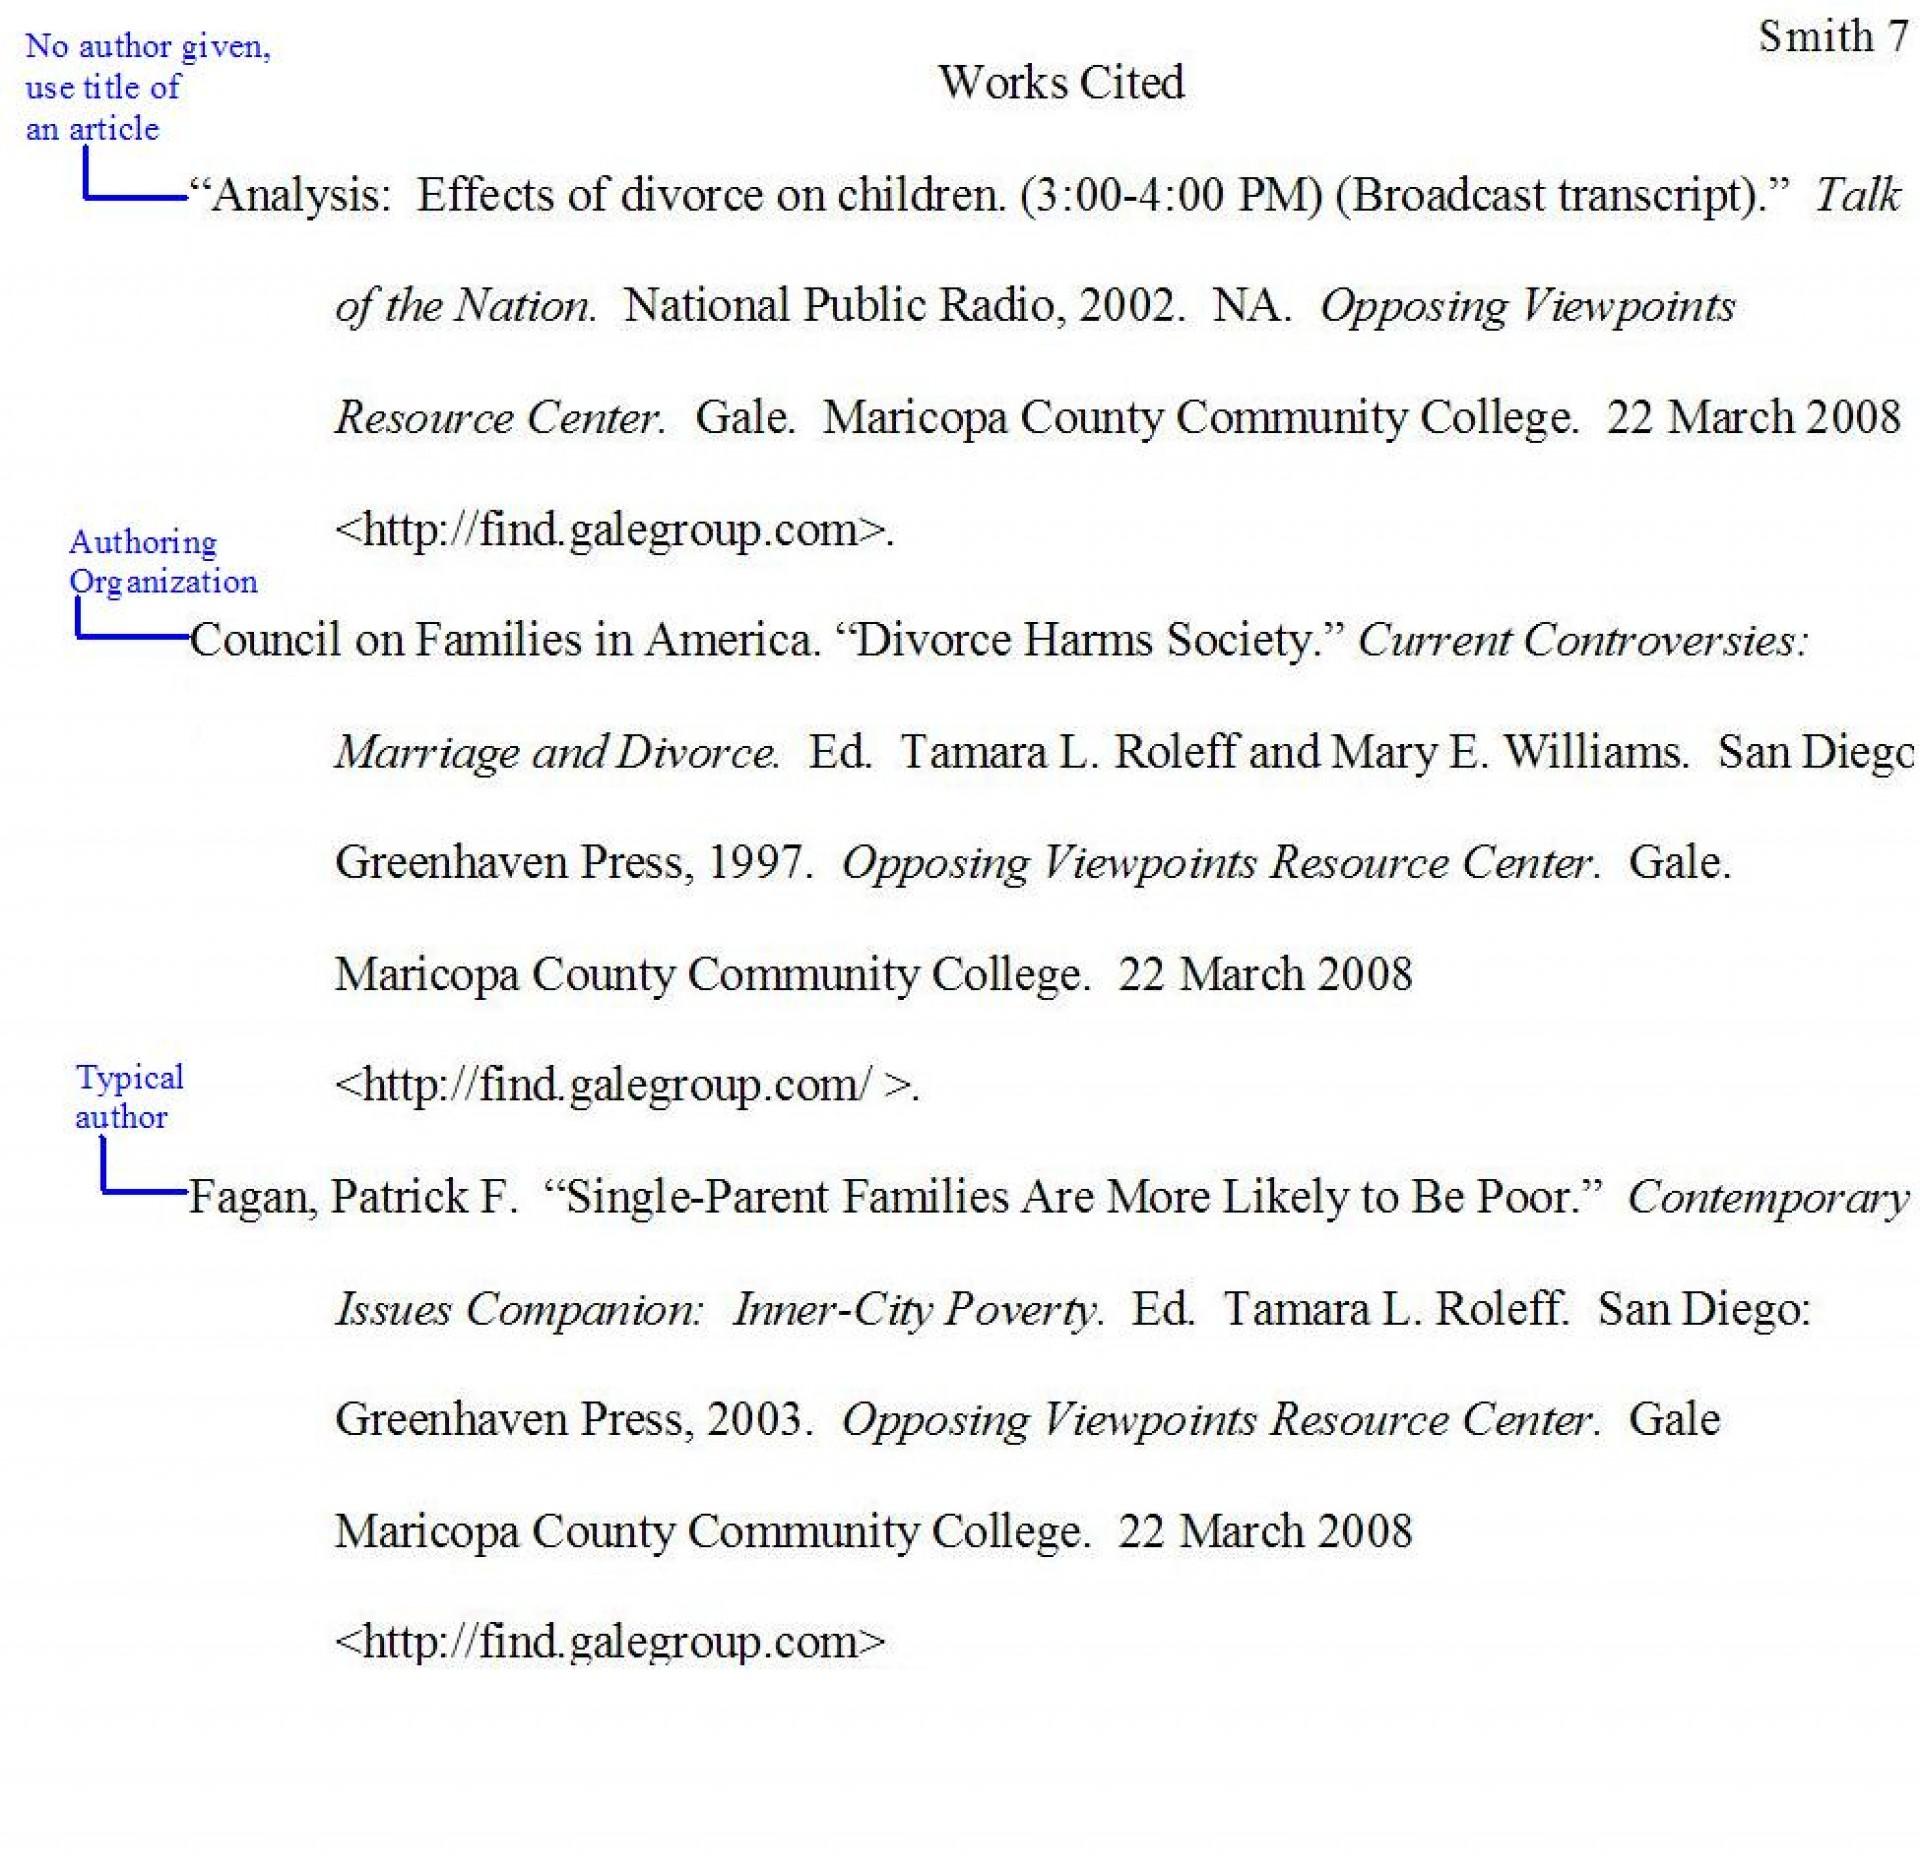 019 Mla Format Essay Sample Samplewrkctd Jpg Beautiful Example 2017 Comparison Narrative 1920